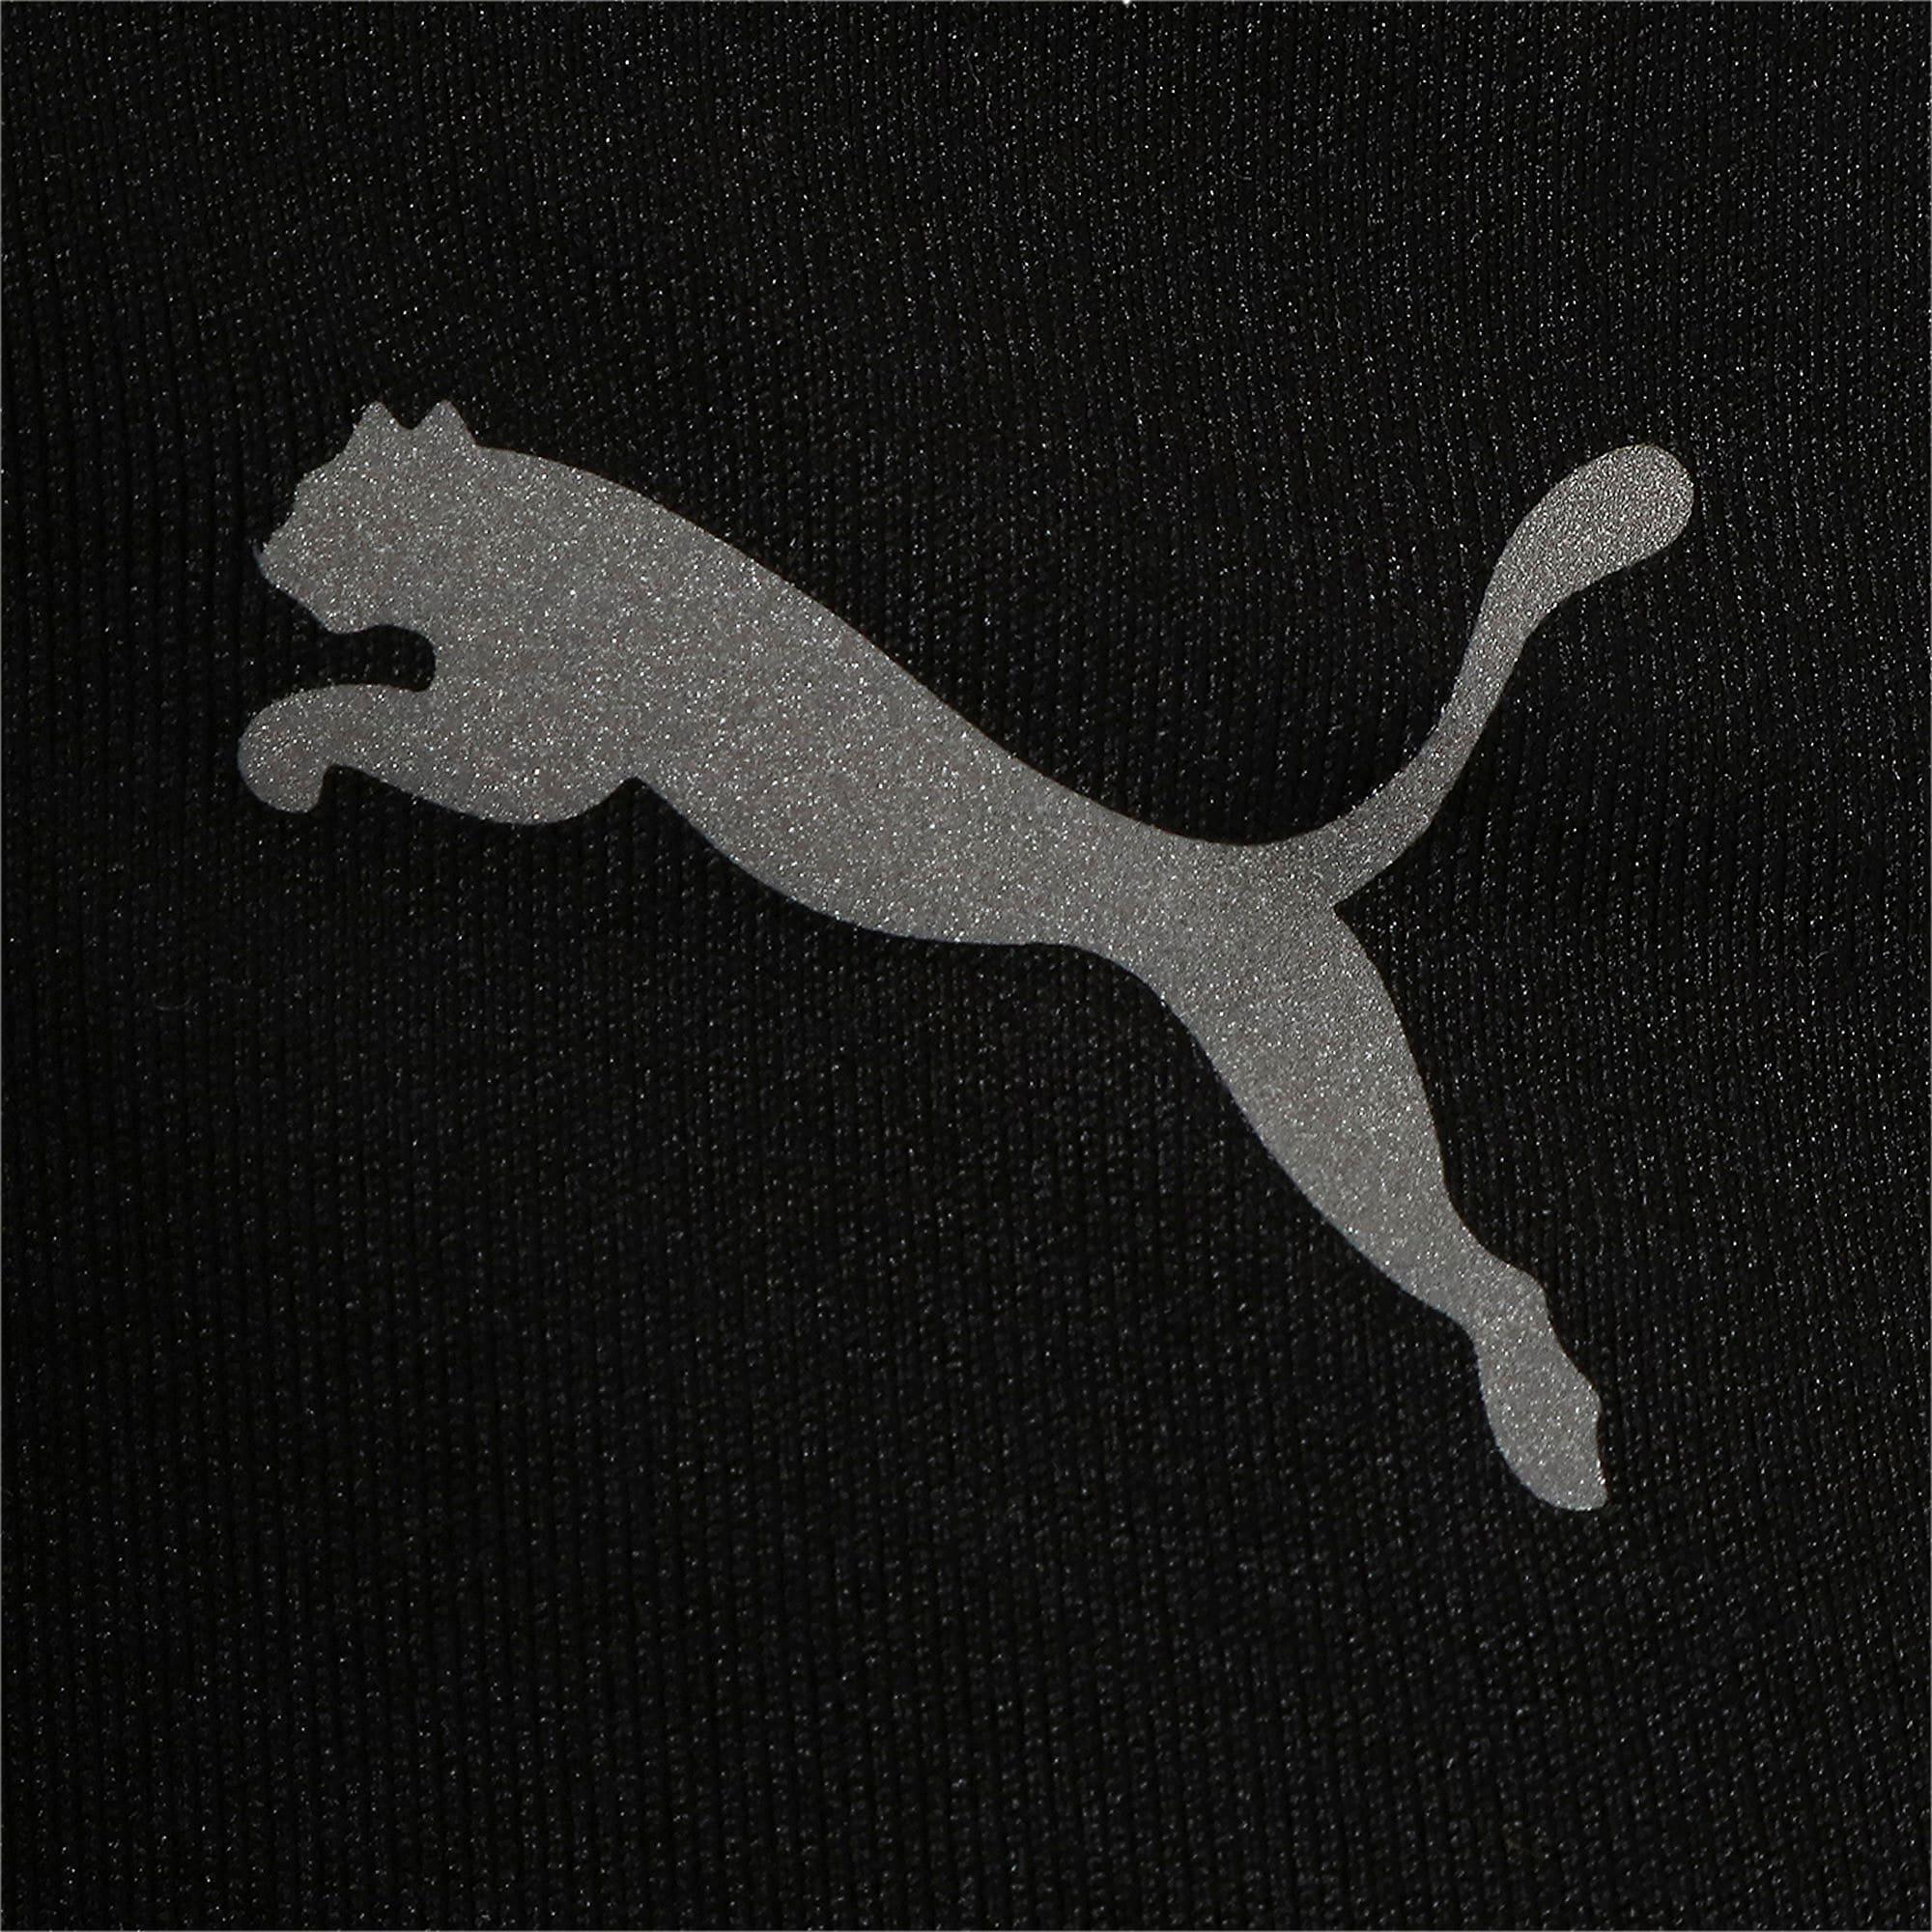 Thumbnail 4 of テック ライト LSモックネック ウィメンズ トレーニング Tシャツ 長袖, Puma Black, medium-JPN